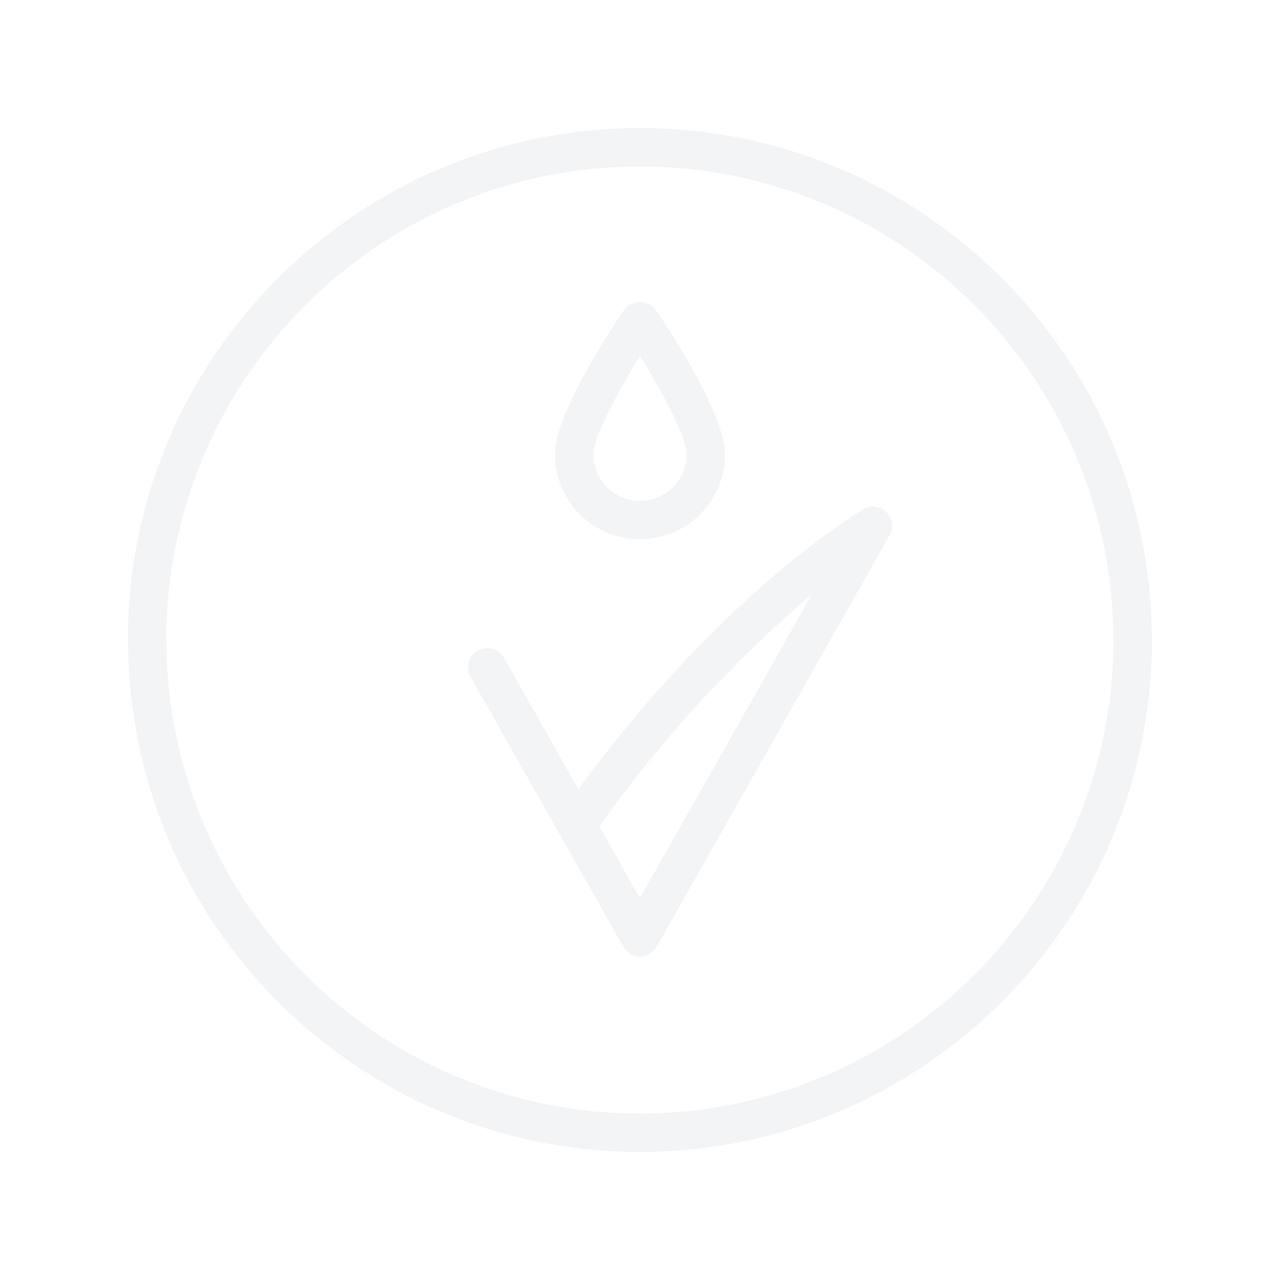 LA ROCHE-POSAY Toleriane Soothing Skincare 40ml